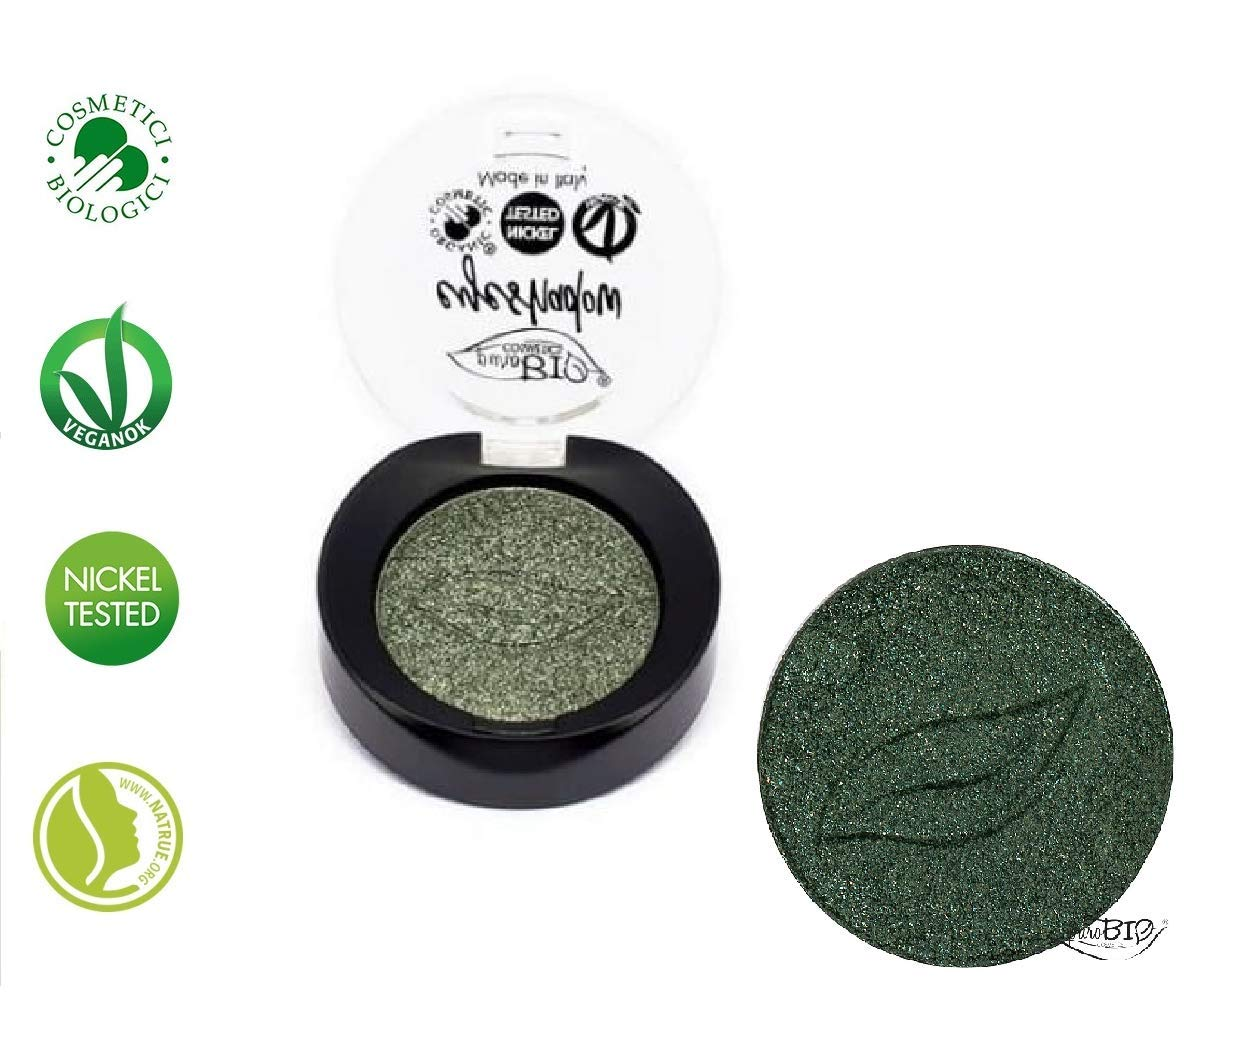 PUROBIO – Compact Eyeshadows N.22 – Shimmery Green – Very luminous brass coloured shimmer eyeshadow – Duochrome grey – Organic, Vegan, Nickel Tested, made in Italy